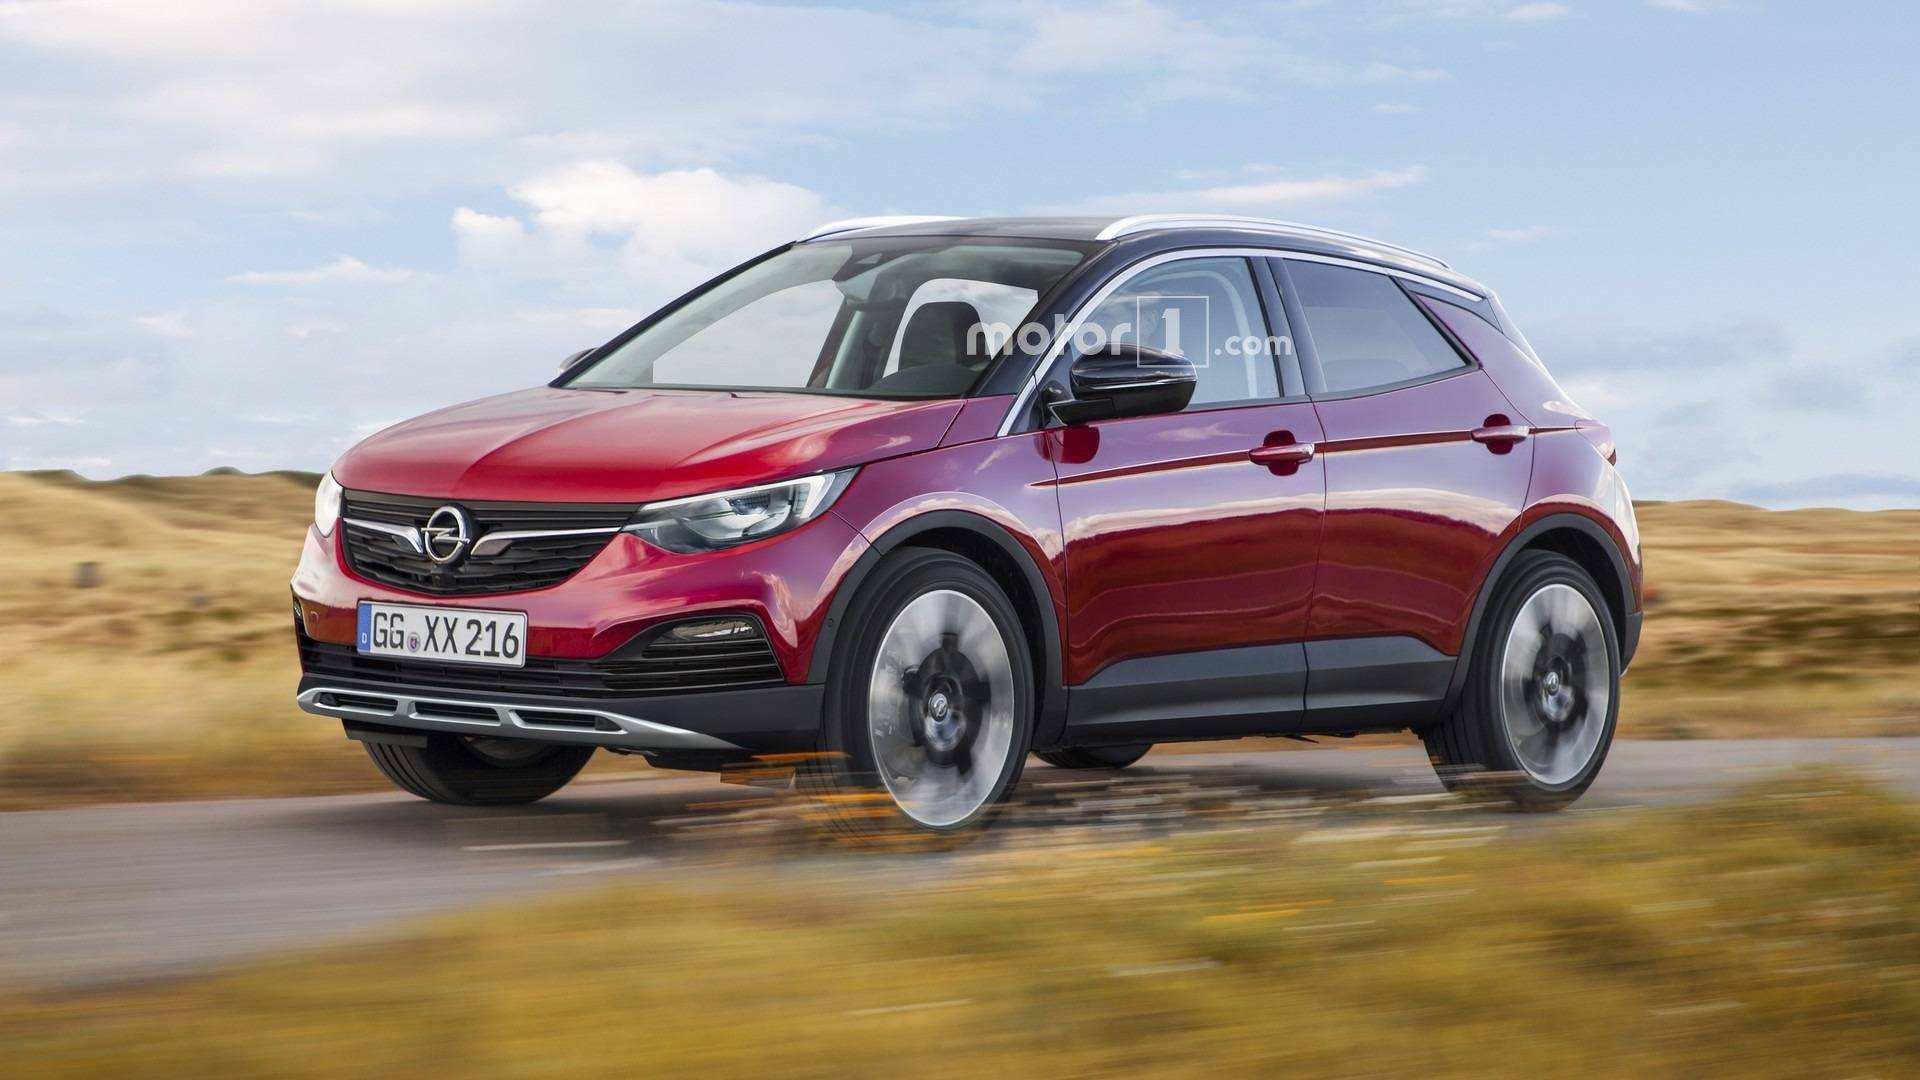 28 Best Review Opel Monza 2020 Overview by Opel Monza 2020